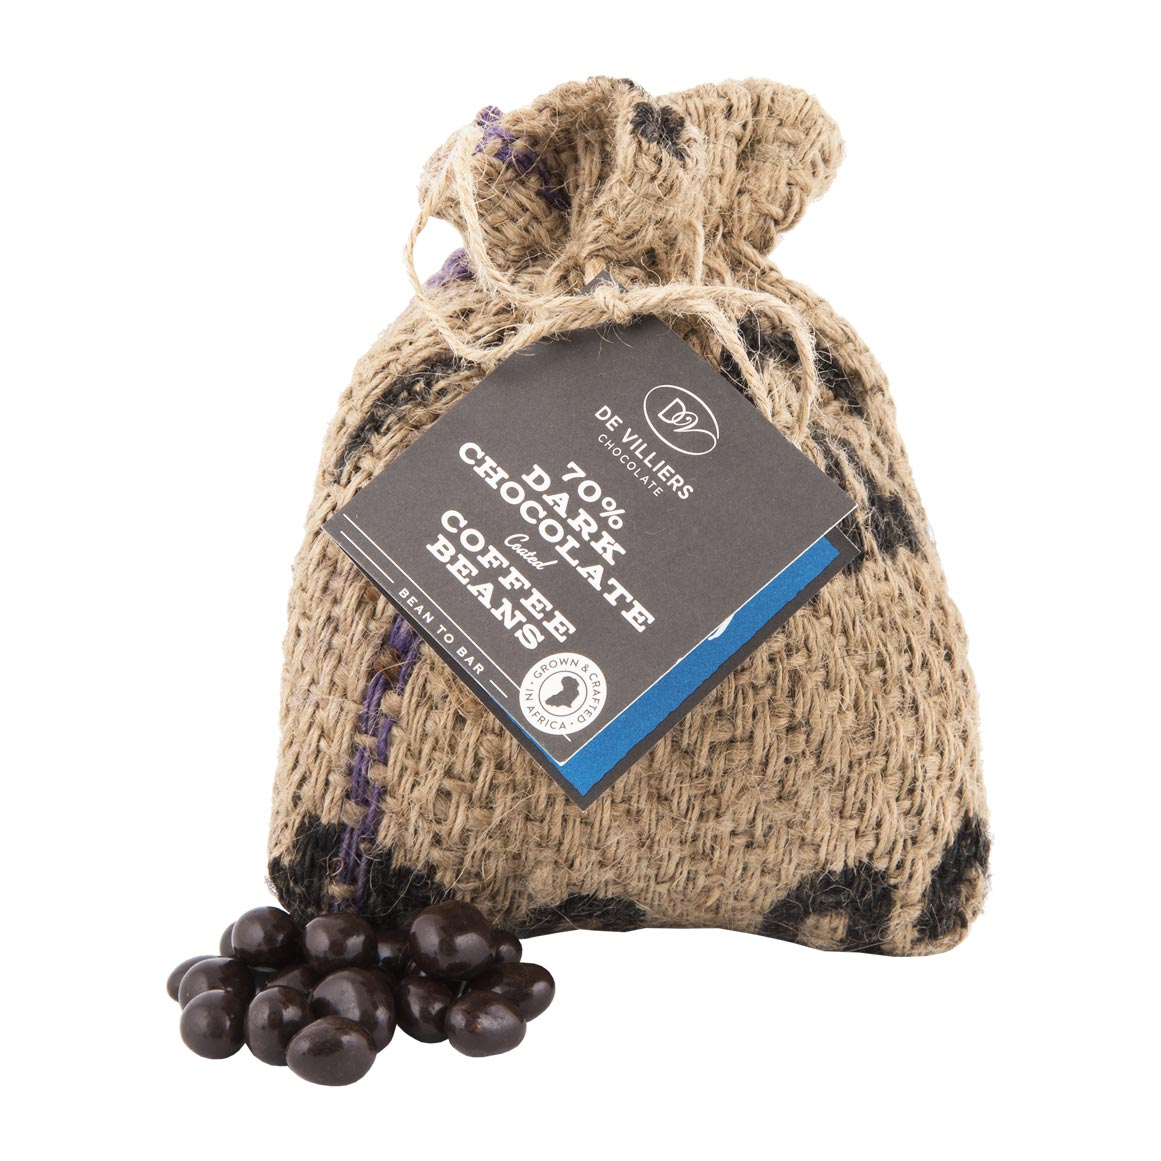 De Villiers 70 Dark Chocolate Coated Coffee Beans